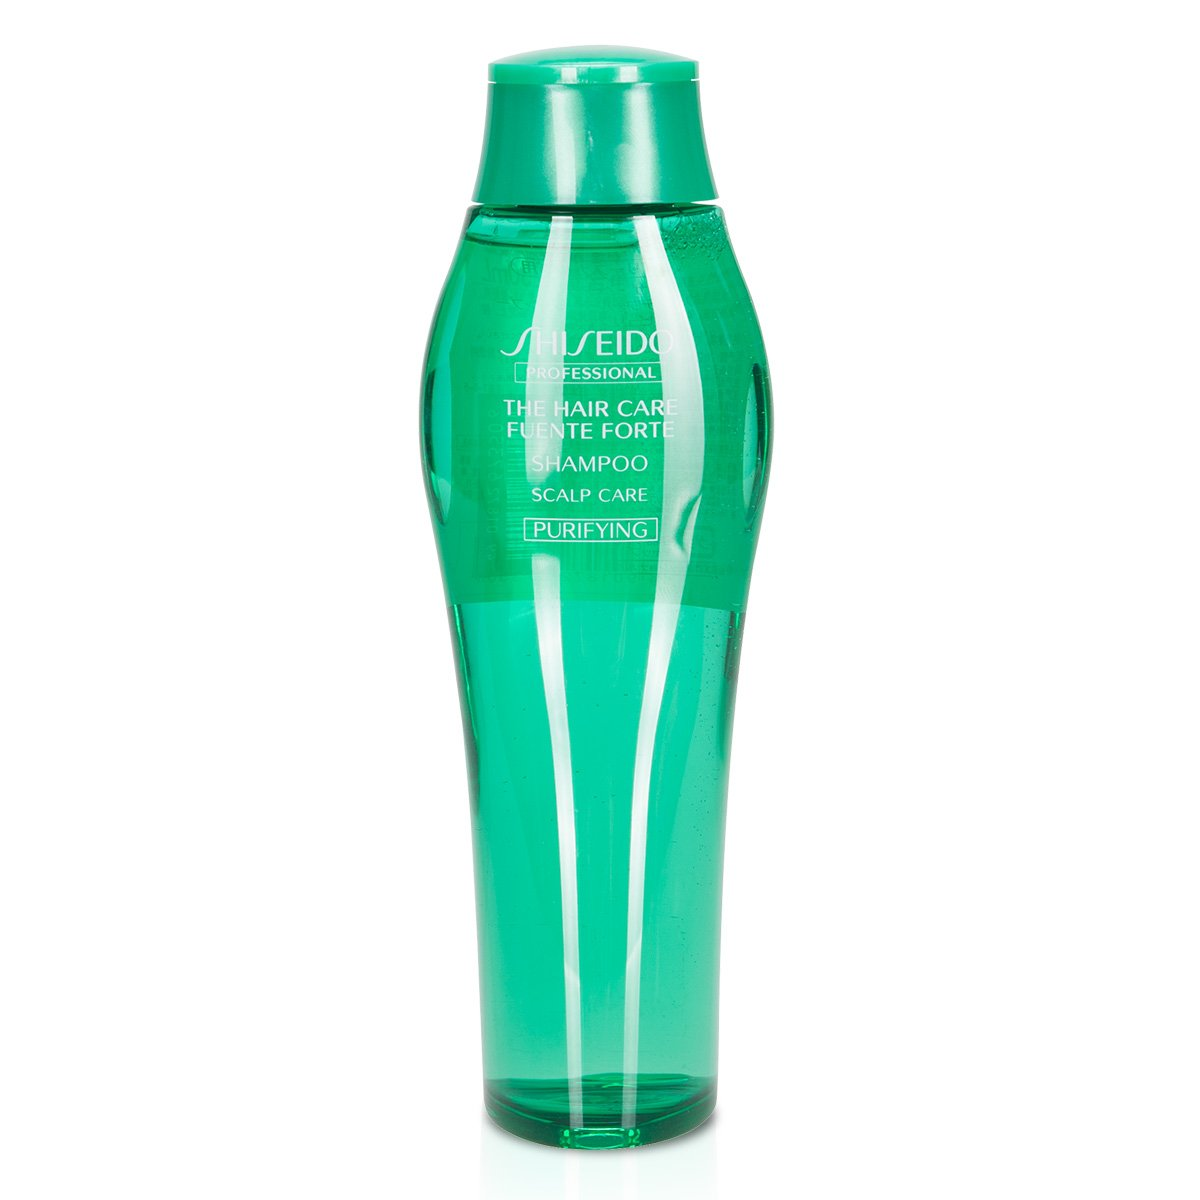 Shiseido The Hair Care Fuente Forte Purifying Shampoo, 8.5 Ounce